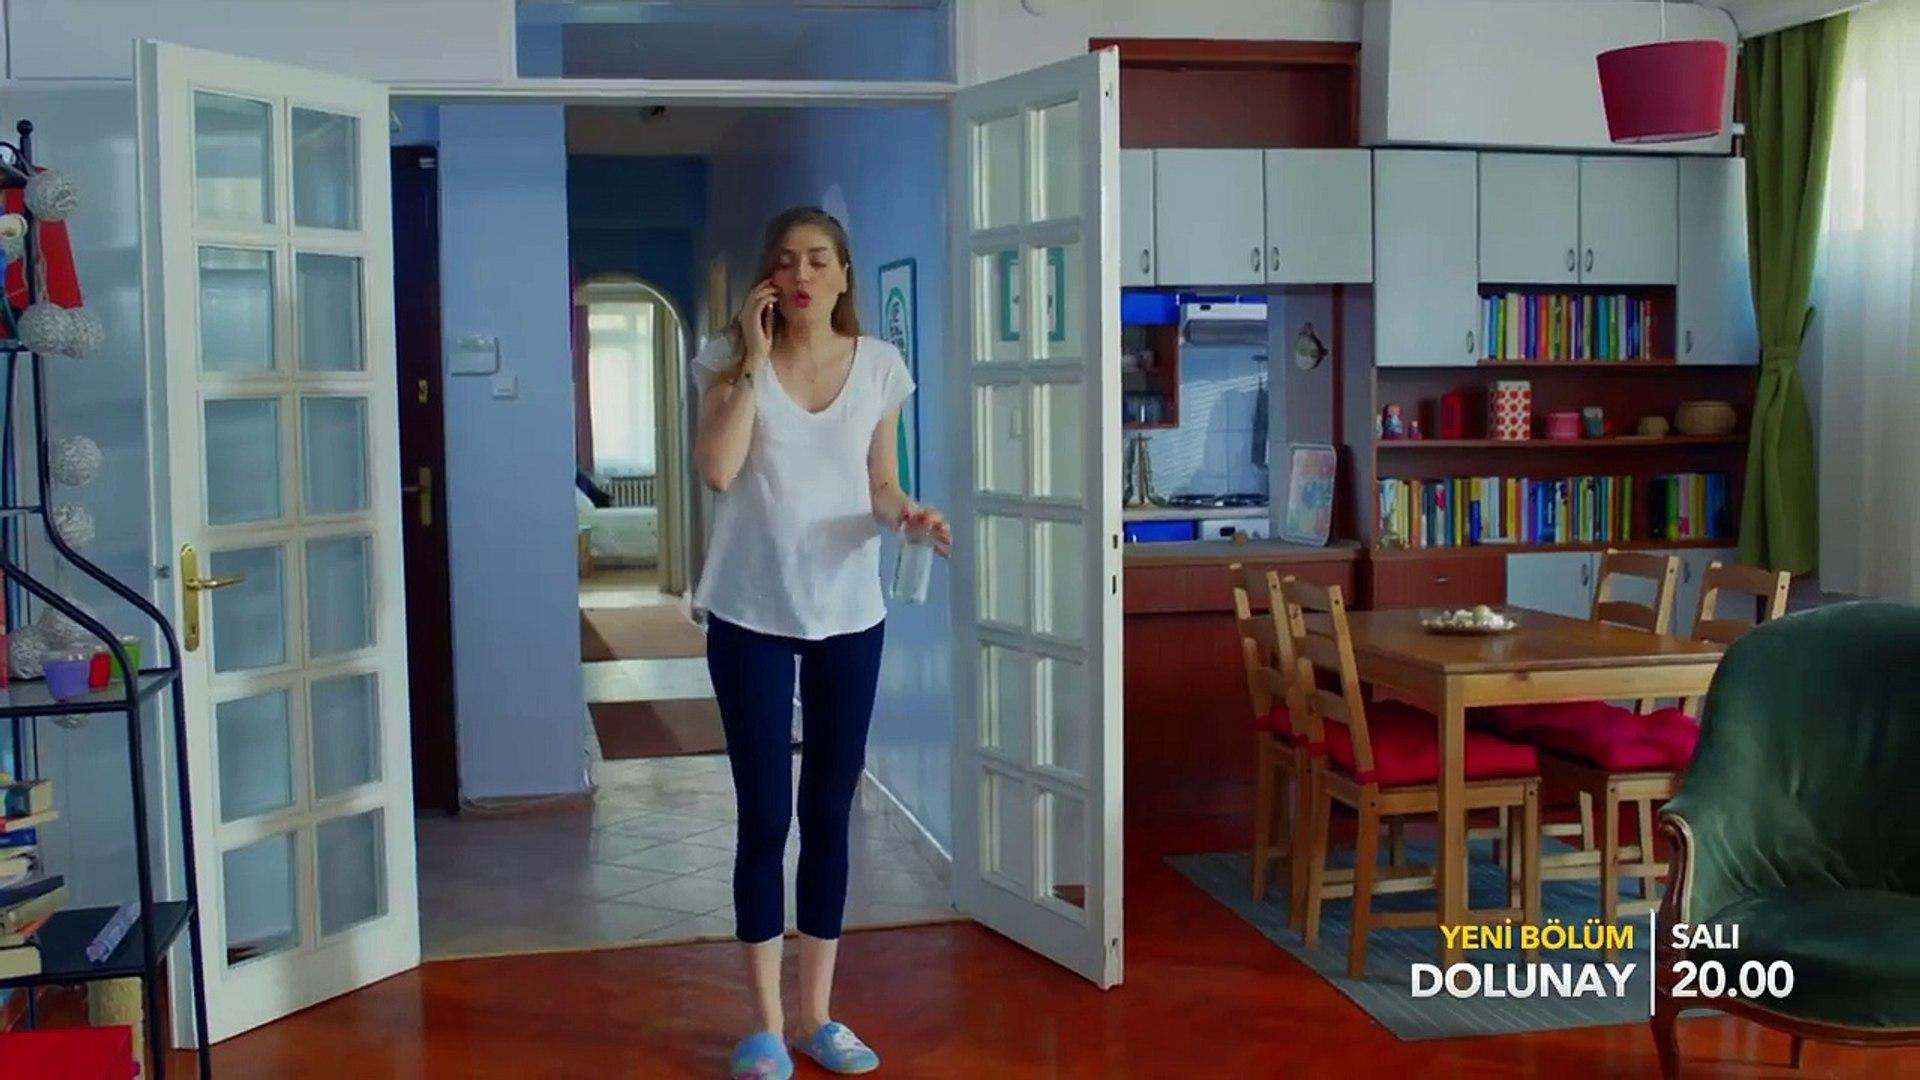 Dolunay / Full Moon Trailer - Episode 2 (Eng & Tur Subs)